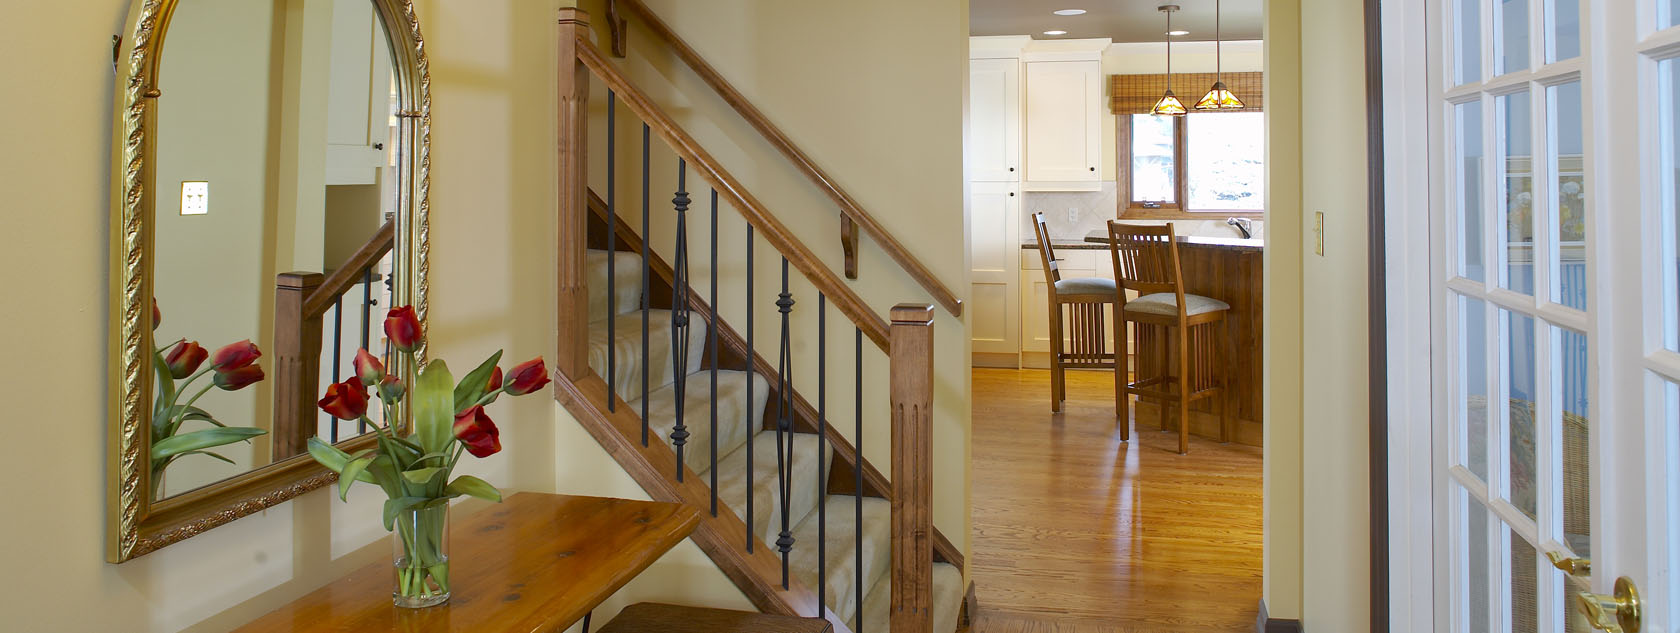 Calgary home renovation reviews l litwiller renovations for Renovation review